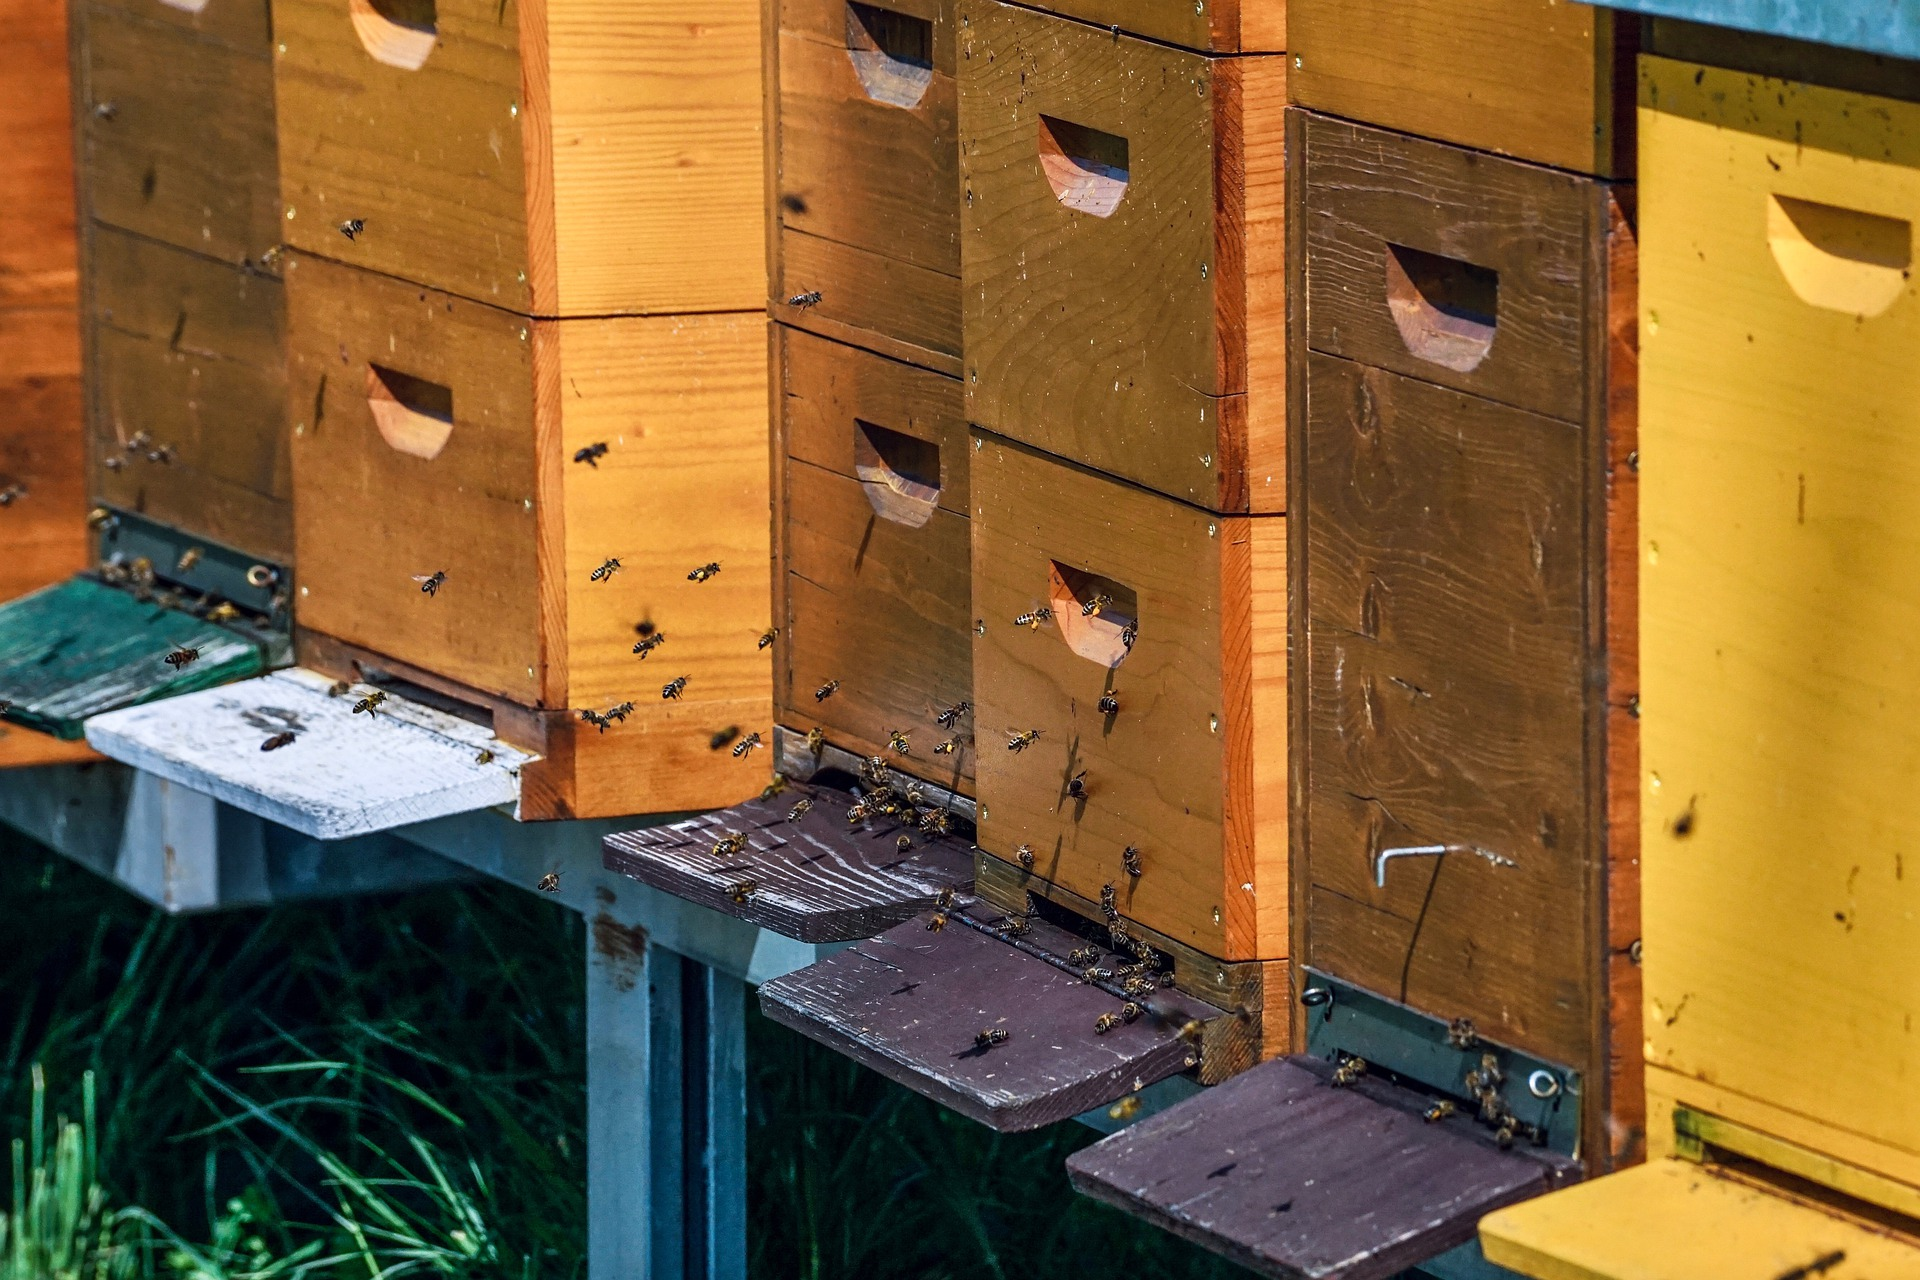 beehive-5026859_1920